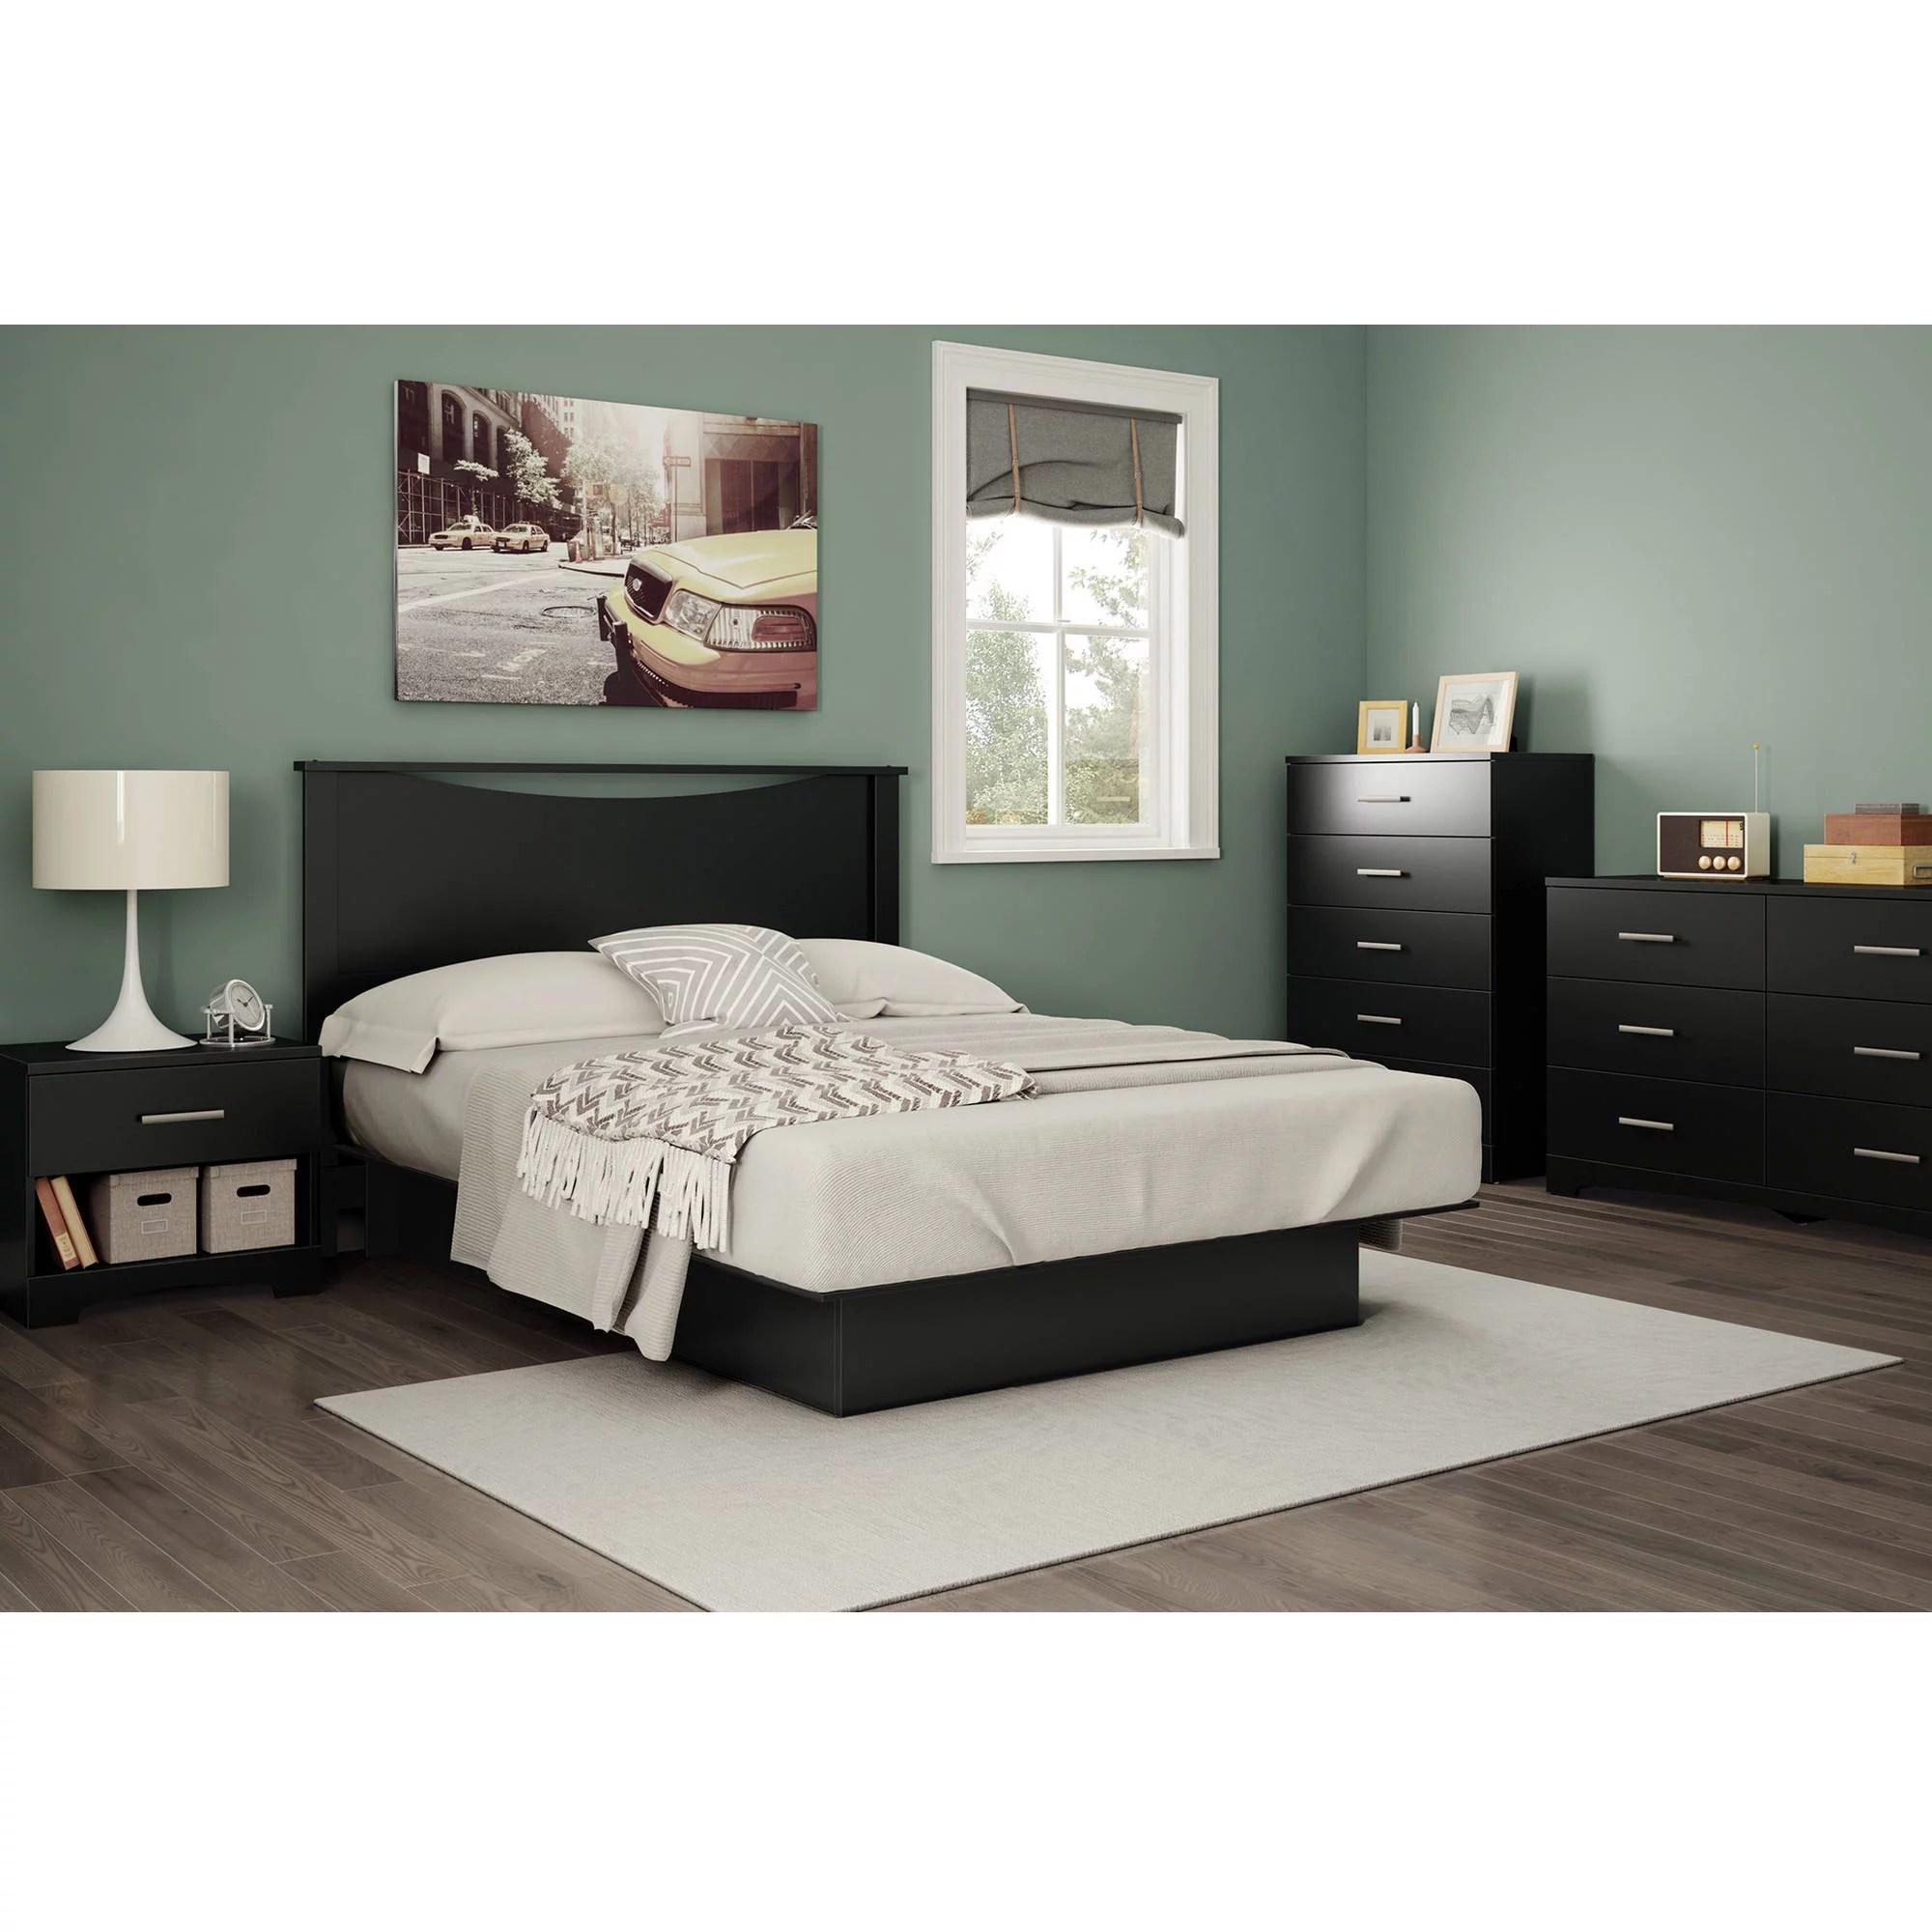 South Shore Gramercy Bedroom Furniture Collection  Walmartcom